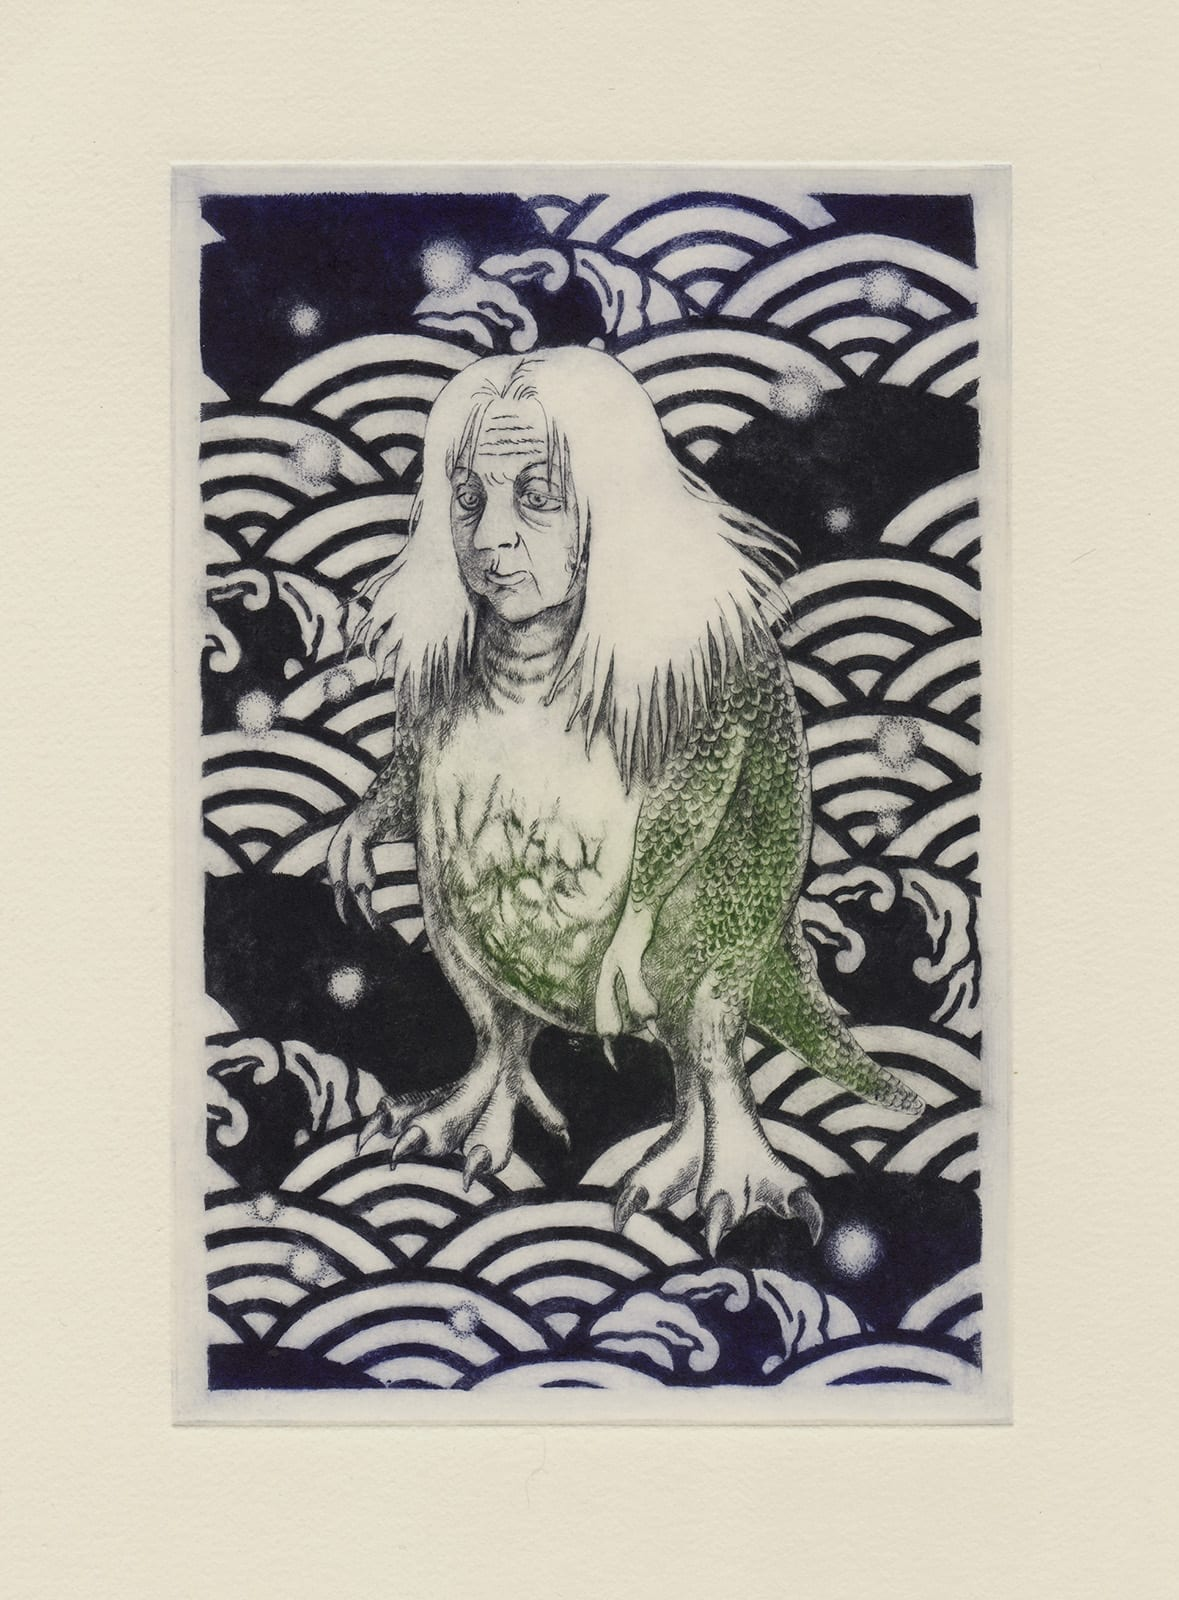 Alie (drypoint etching by Yaemi Shigyo)